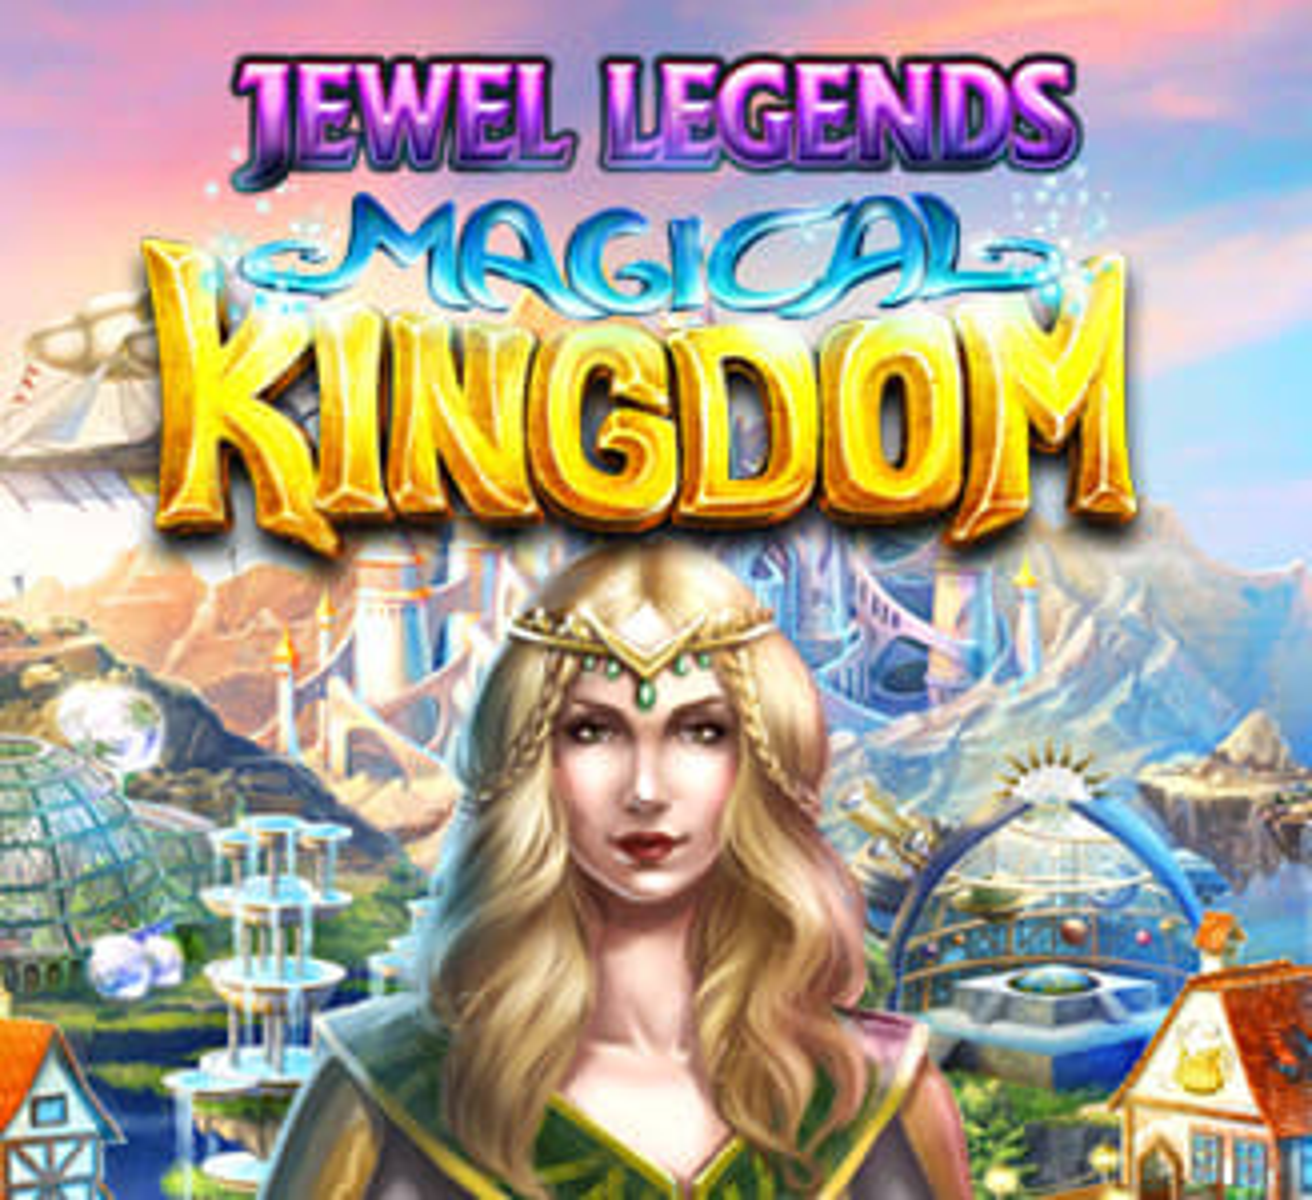 Jewel Legends: Magical Kingdom